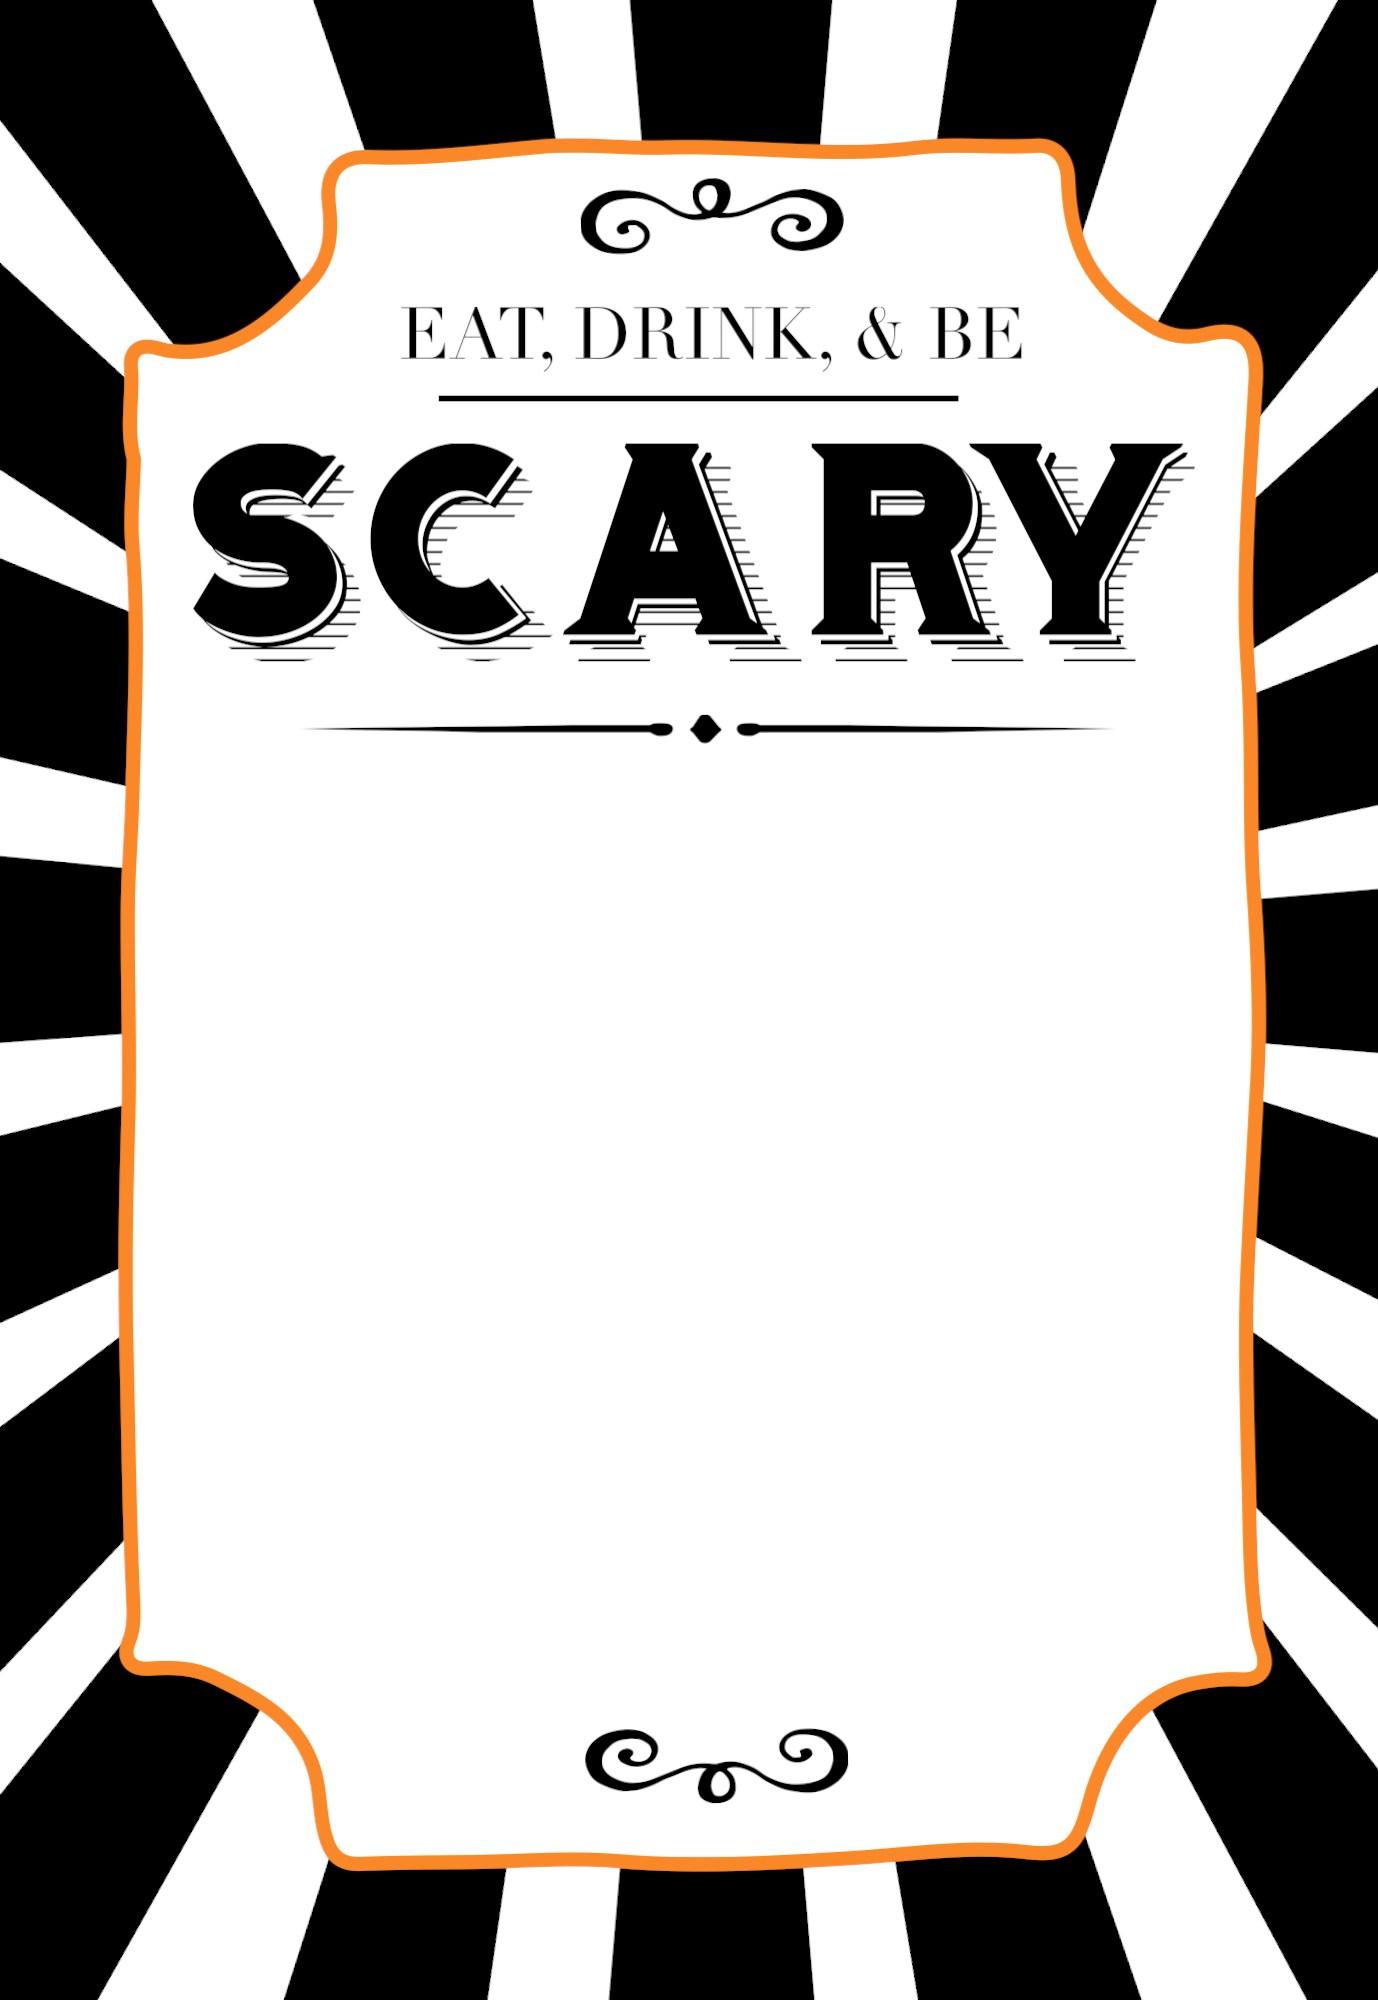 Halloween Invitation Template Copy Fancy Halloween Invitations Free - Free Printable Halloween Invitations